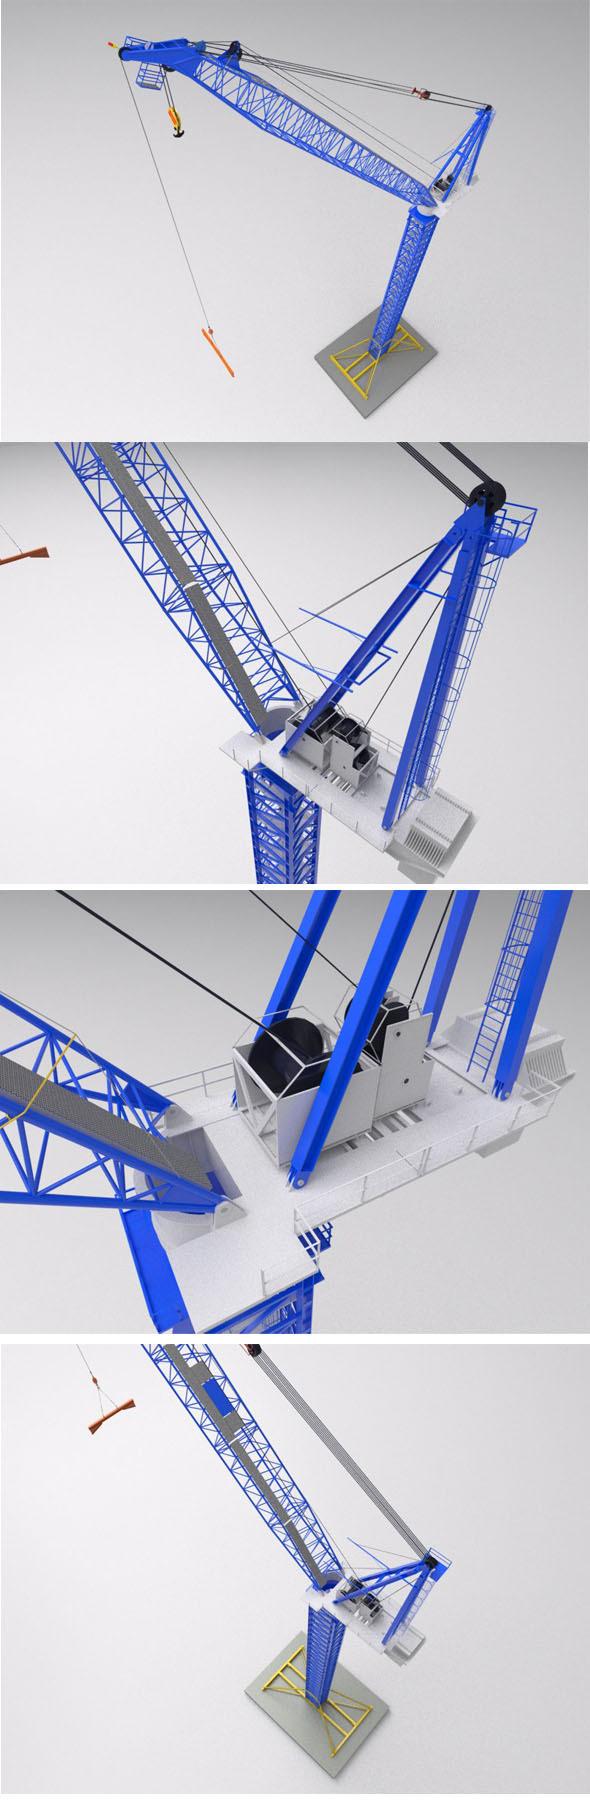 3DOcean Favelle Favco M1280D TOWER crane 12811474